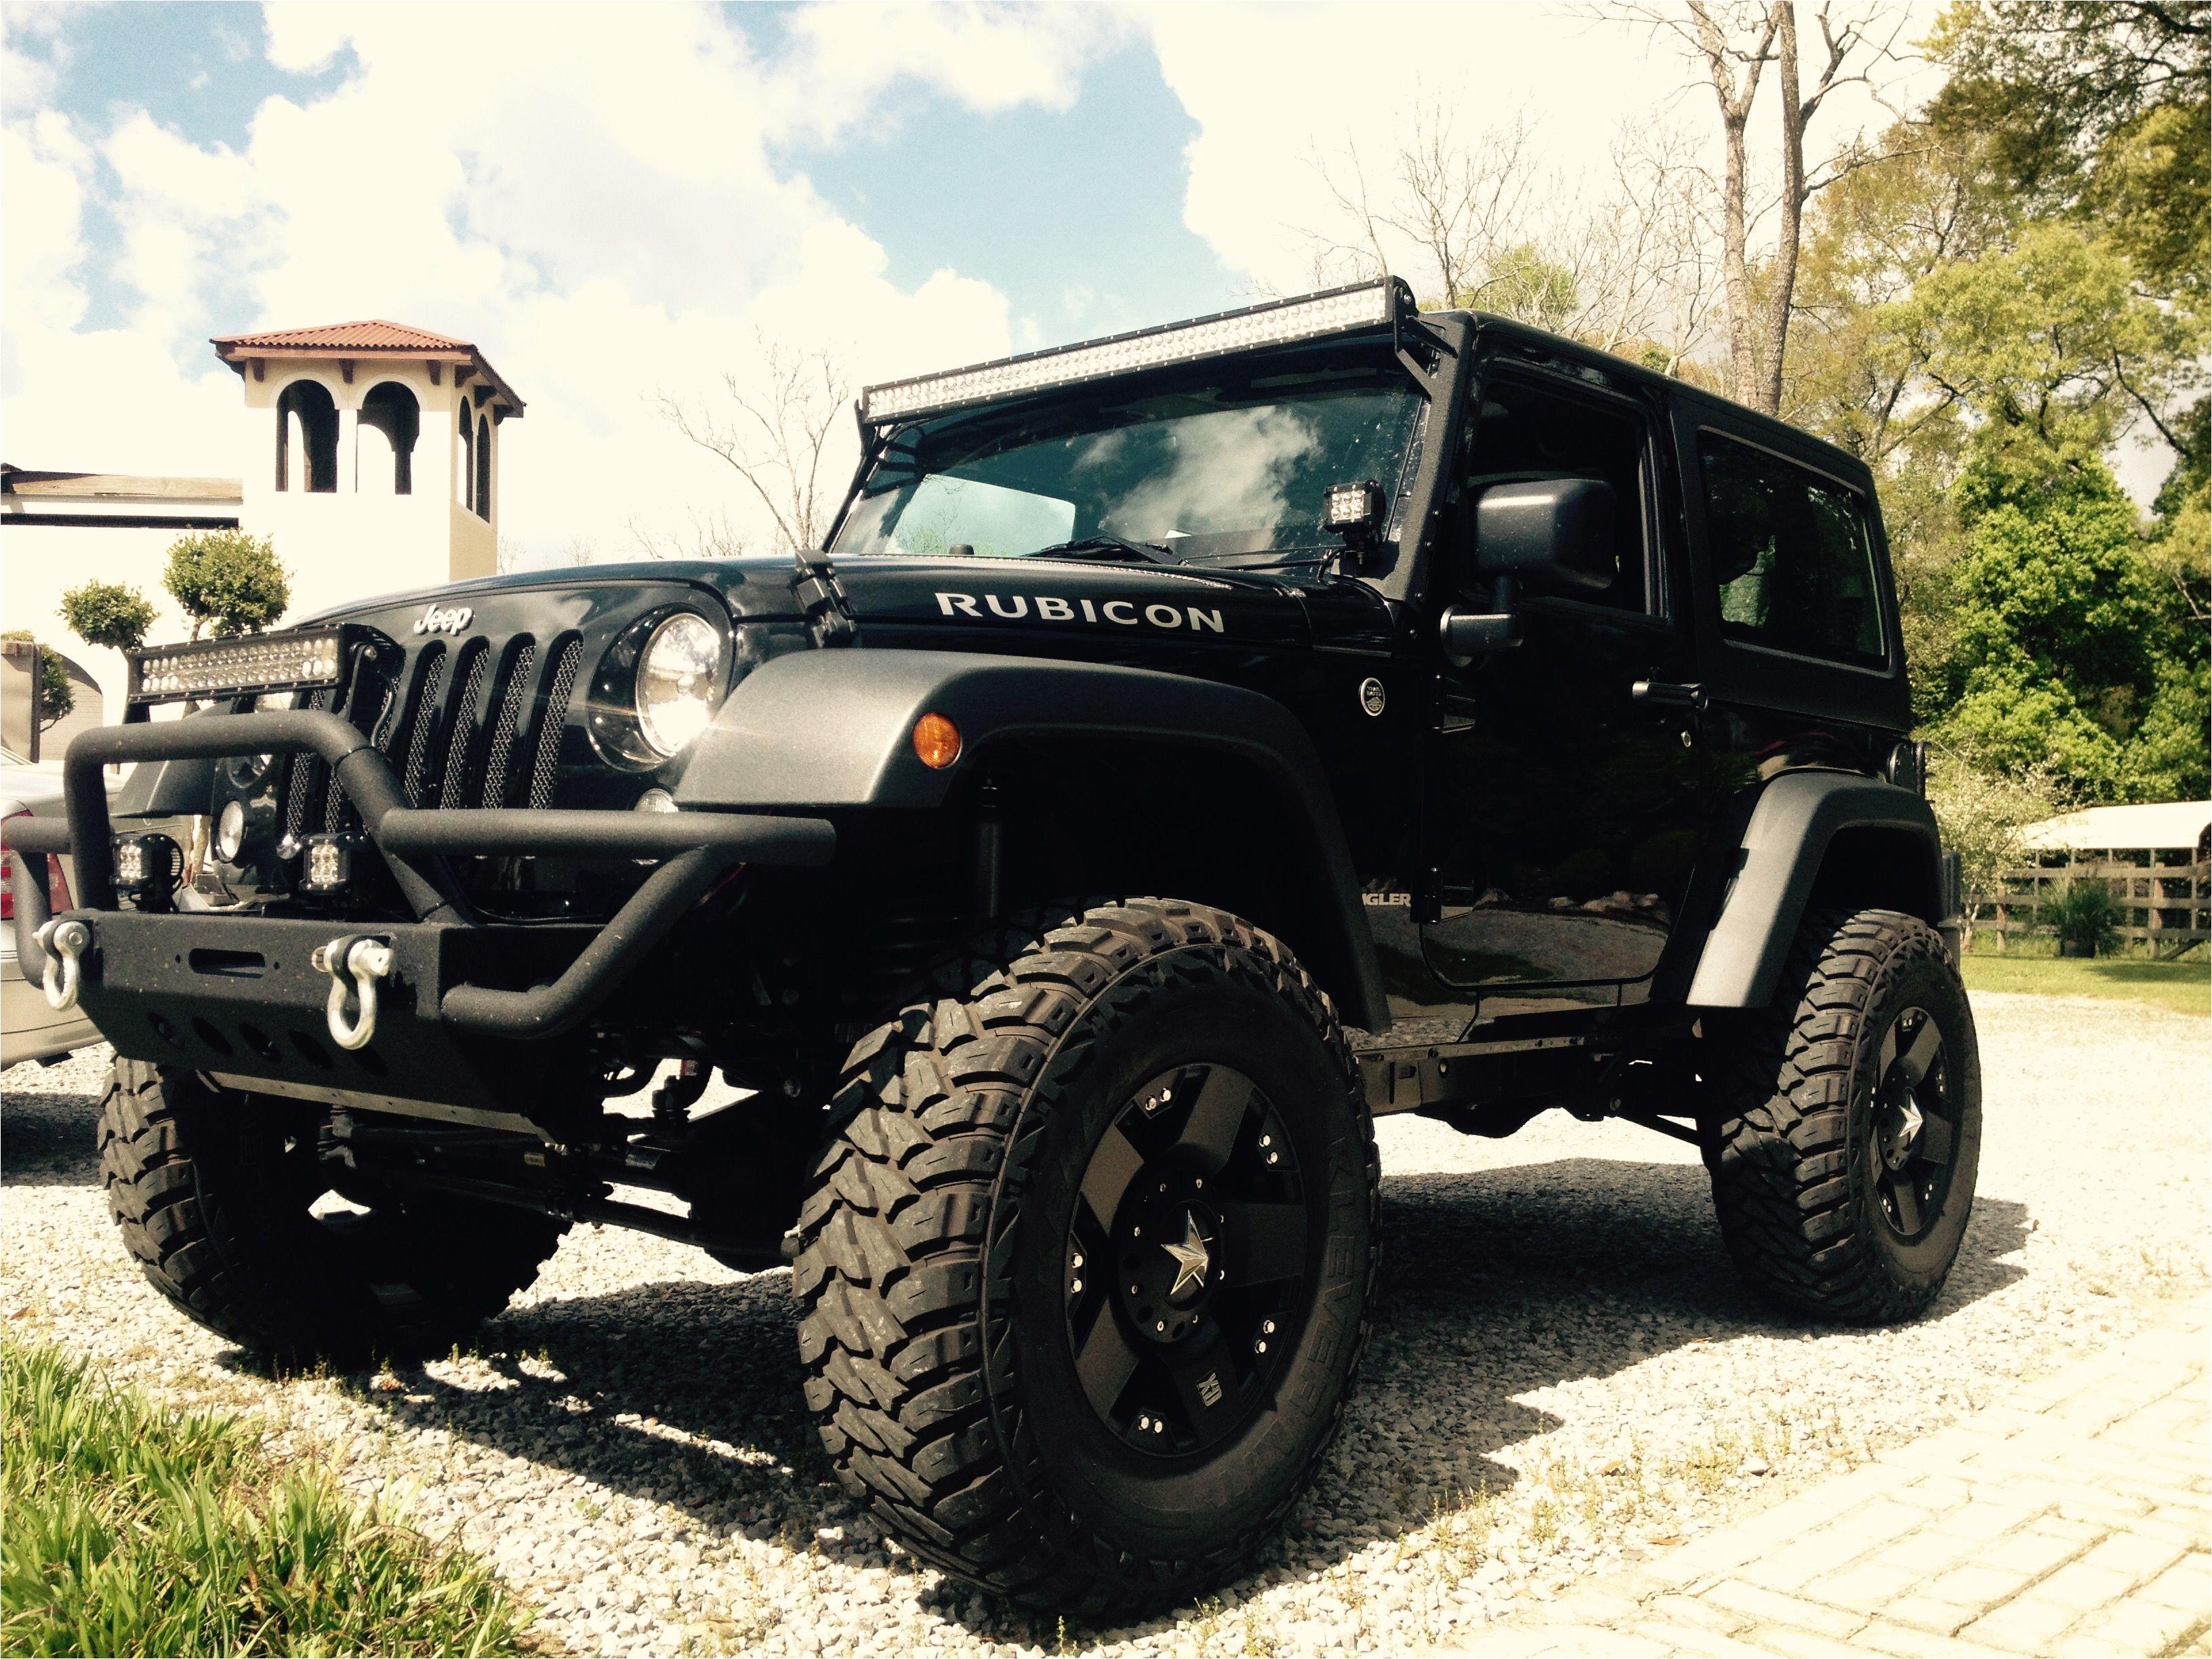 black jeep wrangler 2 door 4 inch lift 35 inch tires black rockstar rims 50 inch led light bar 24 inch led light bar led pod lights rubicon